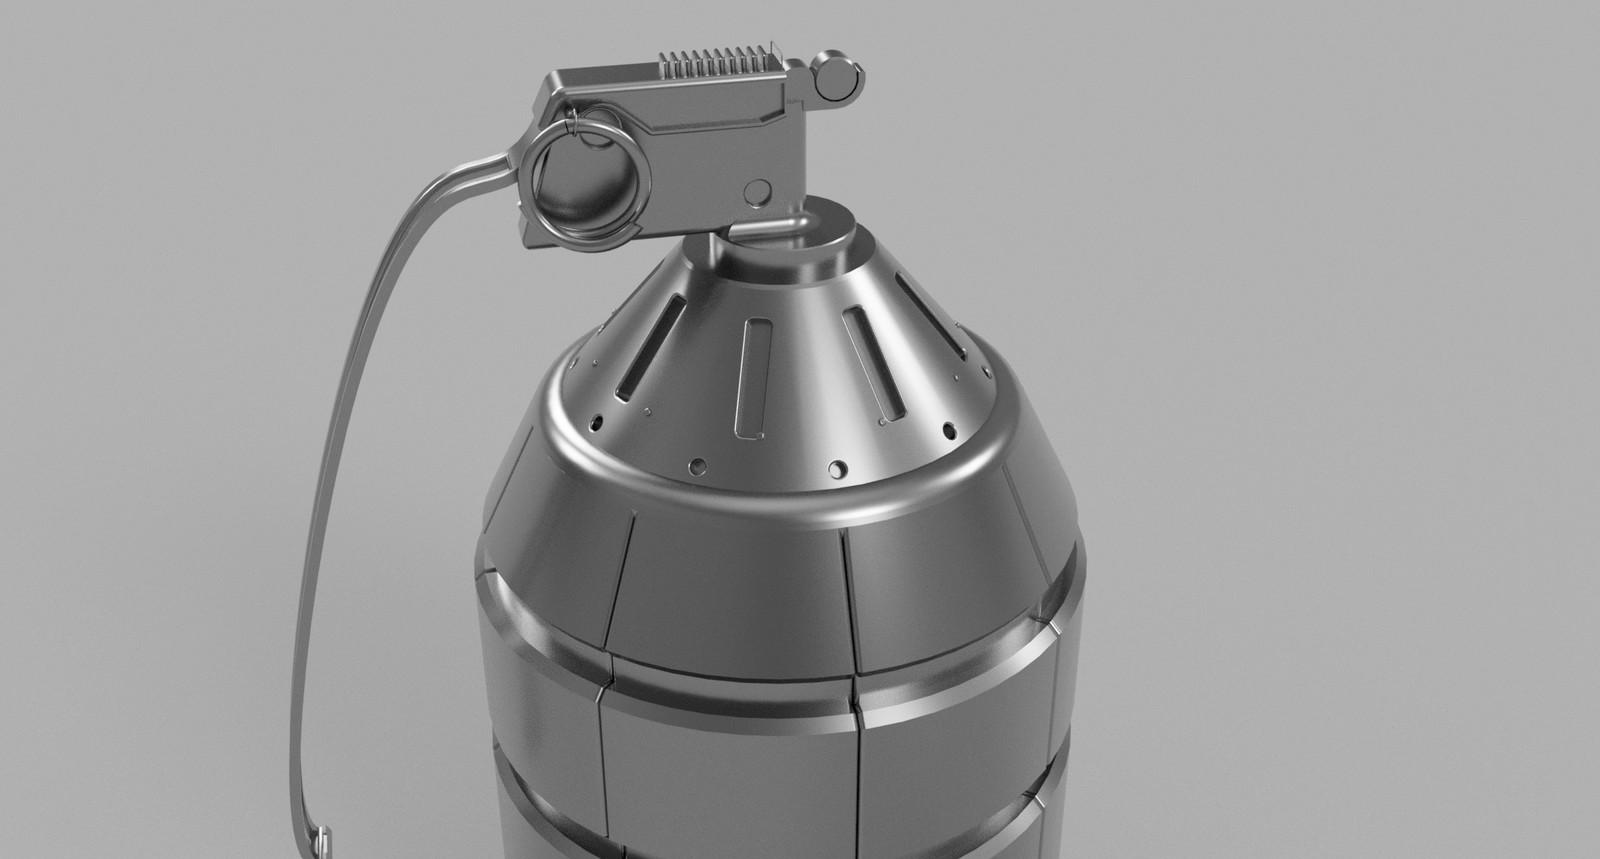 Grenade test